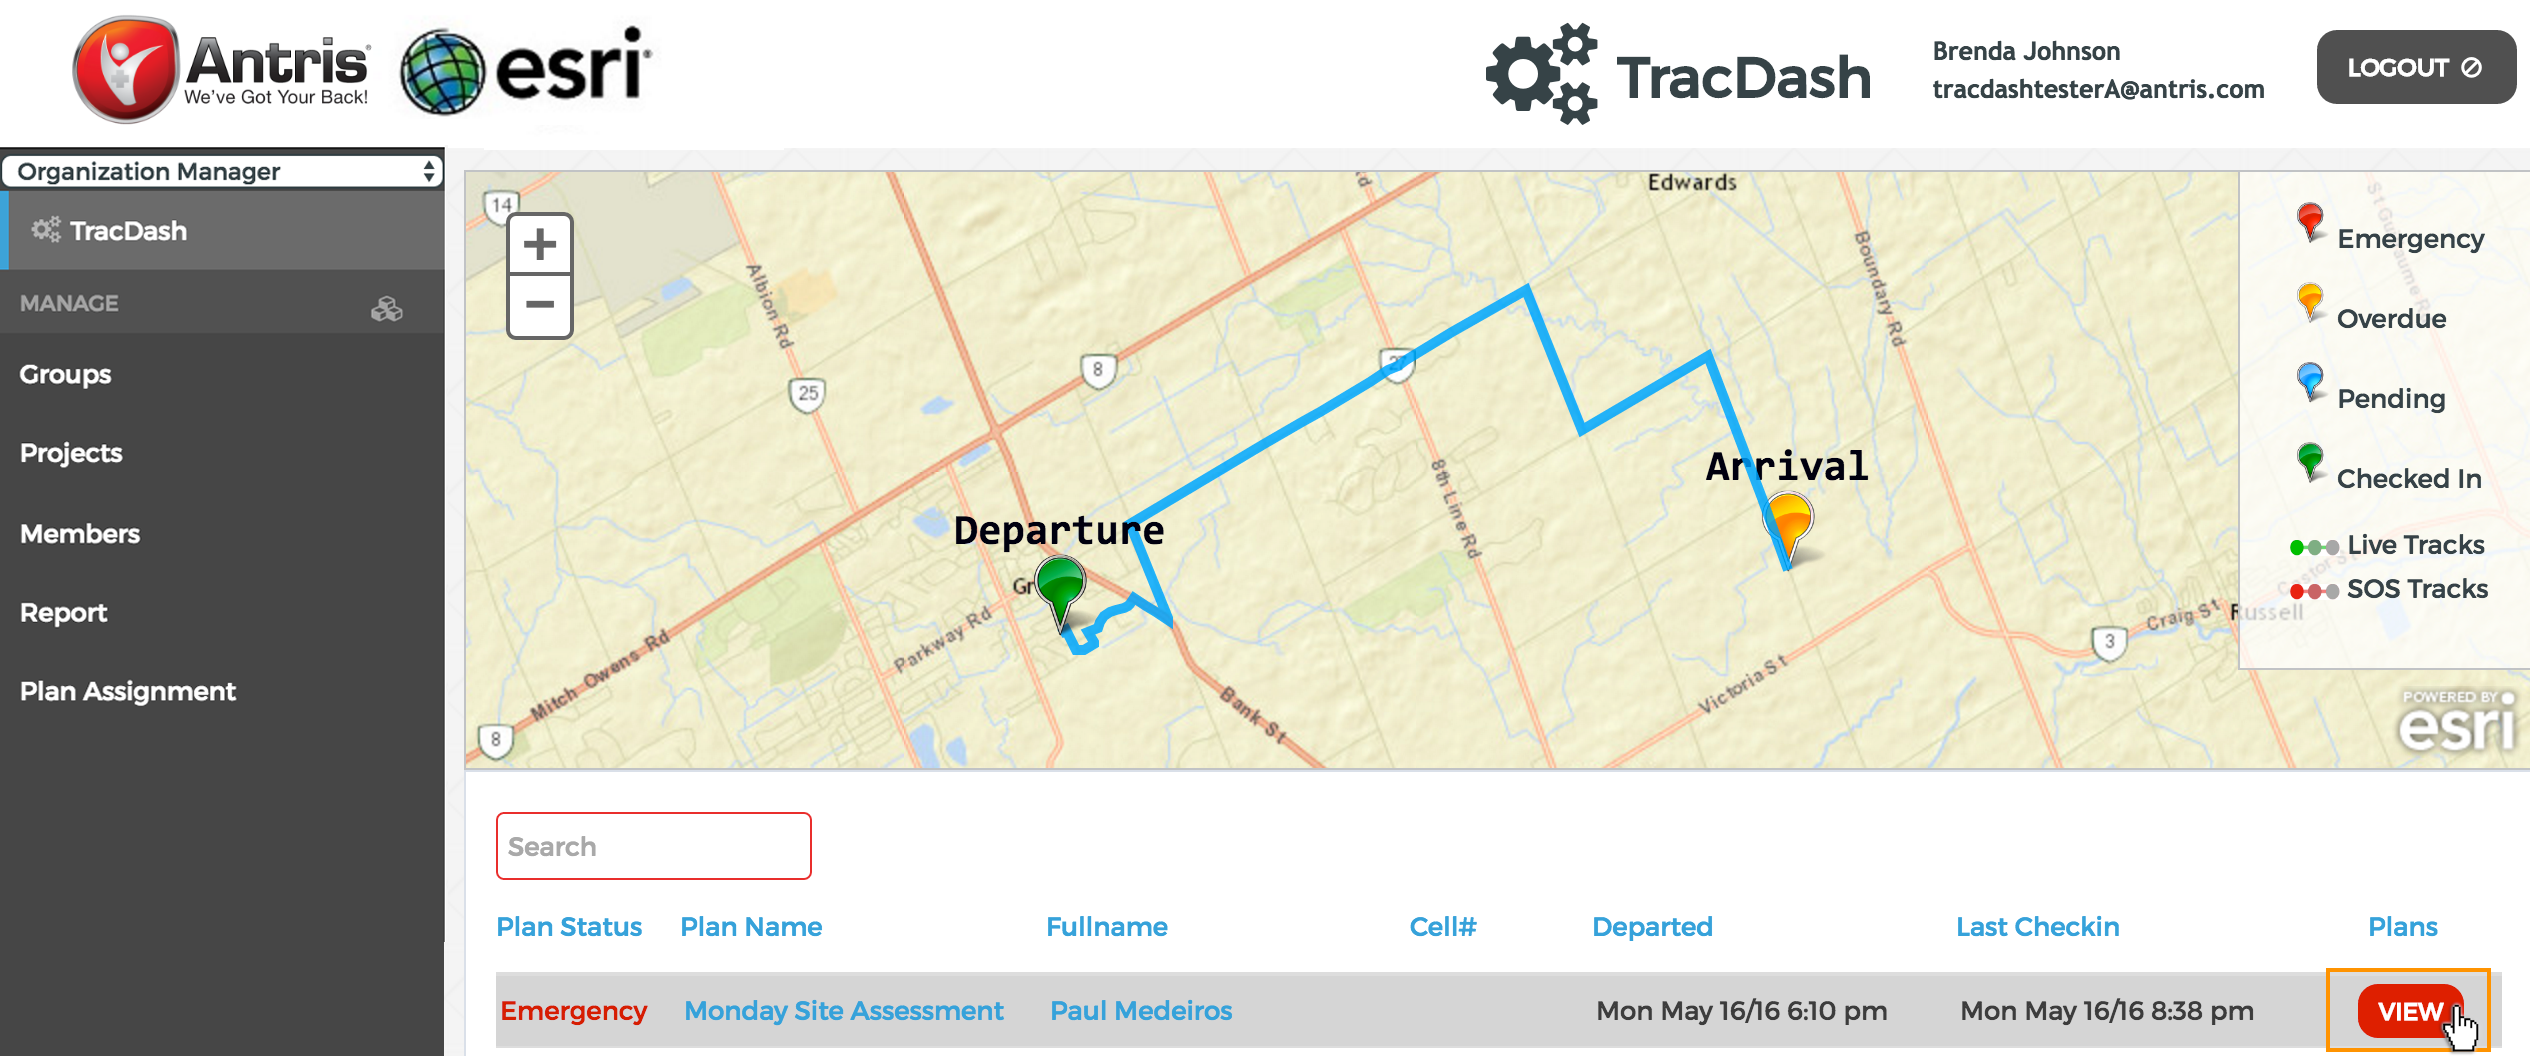 Trac Dash Map